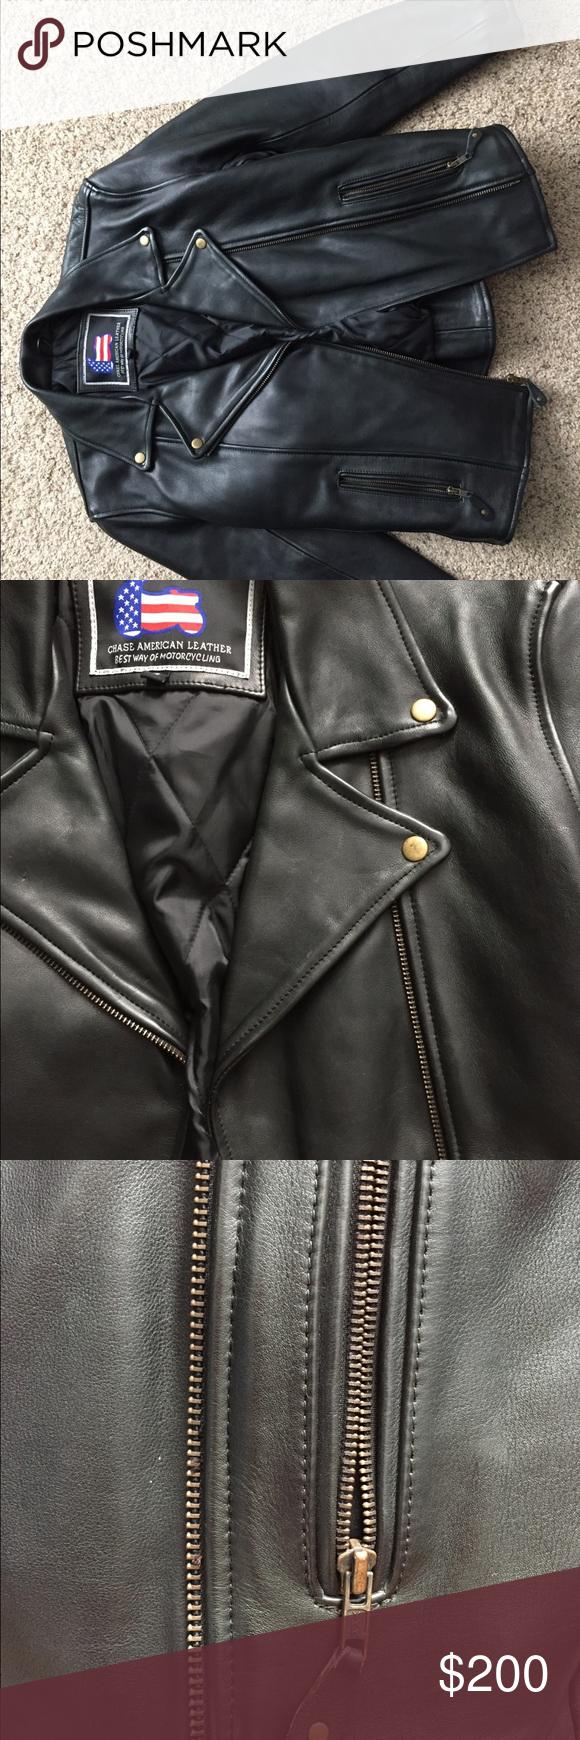 Chase American Leather Motorcycle Jacket Heavy Leather Motorcycle Jacket Black Leather With Antiqued American Leather Leather Jacket Leather Motorcycle Jacket [ 1740 x 580 Pixel ]